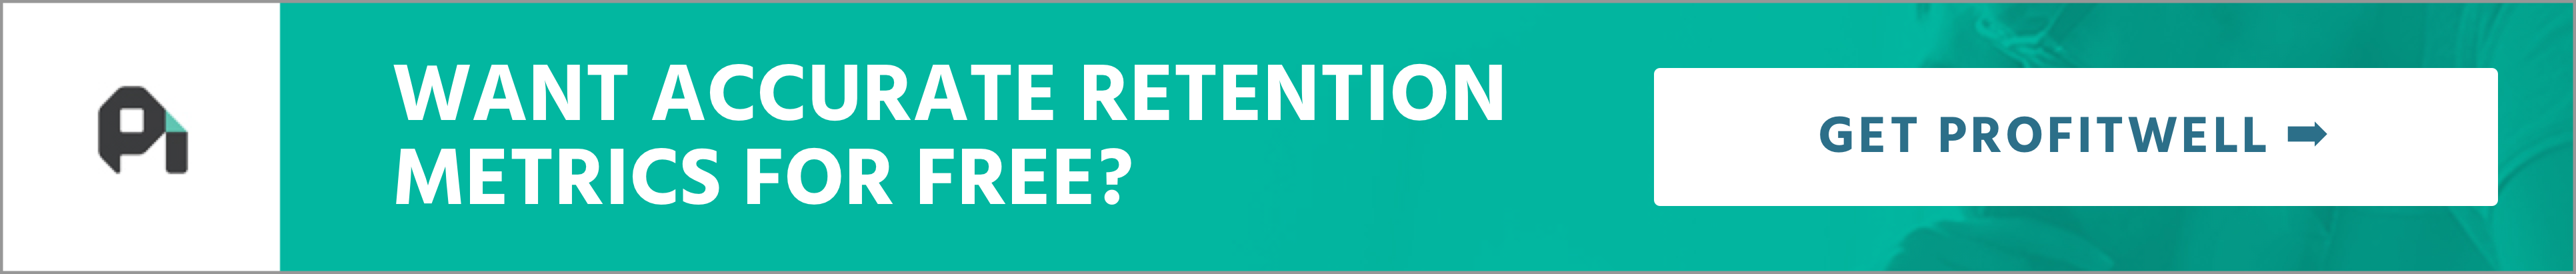 saas-retention-metrics-inline.png